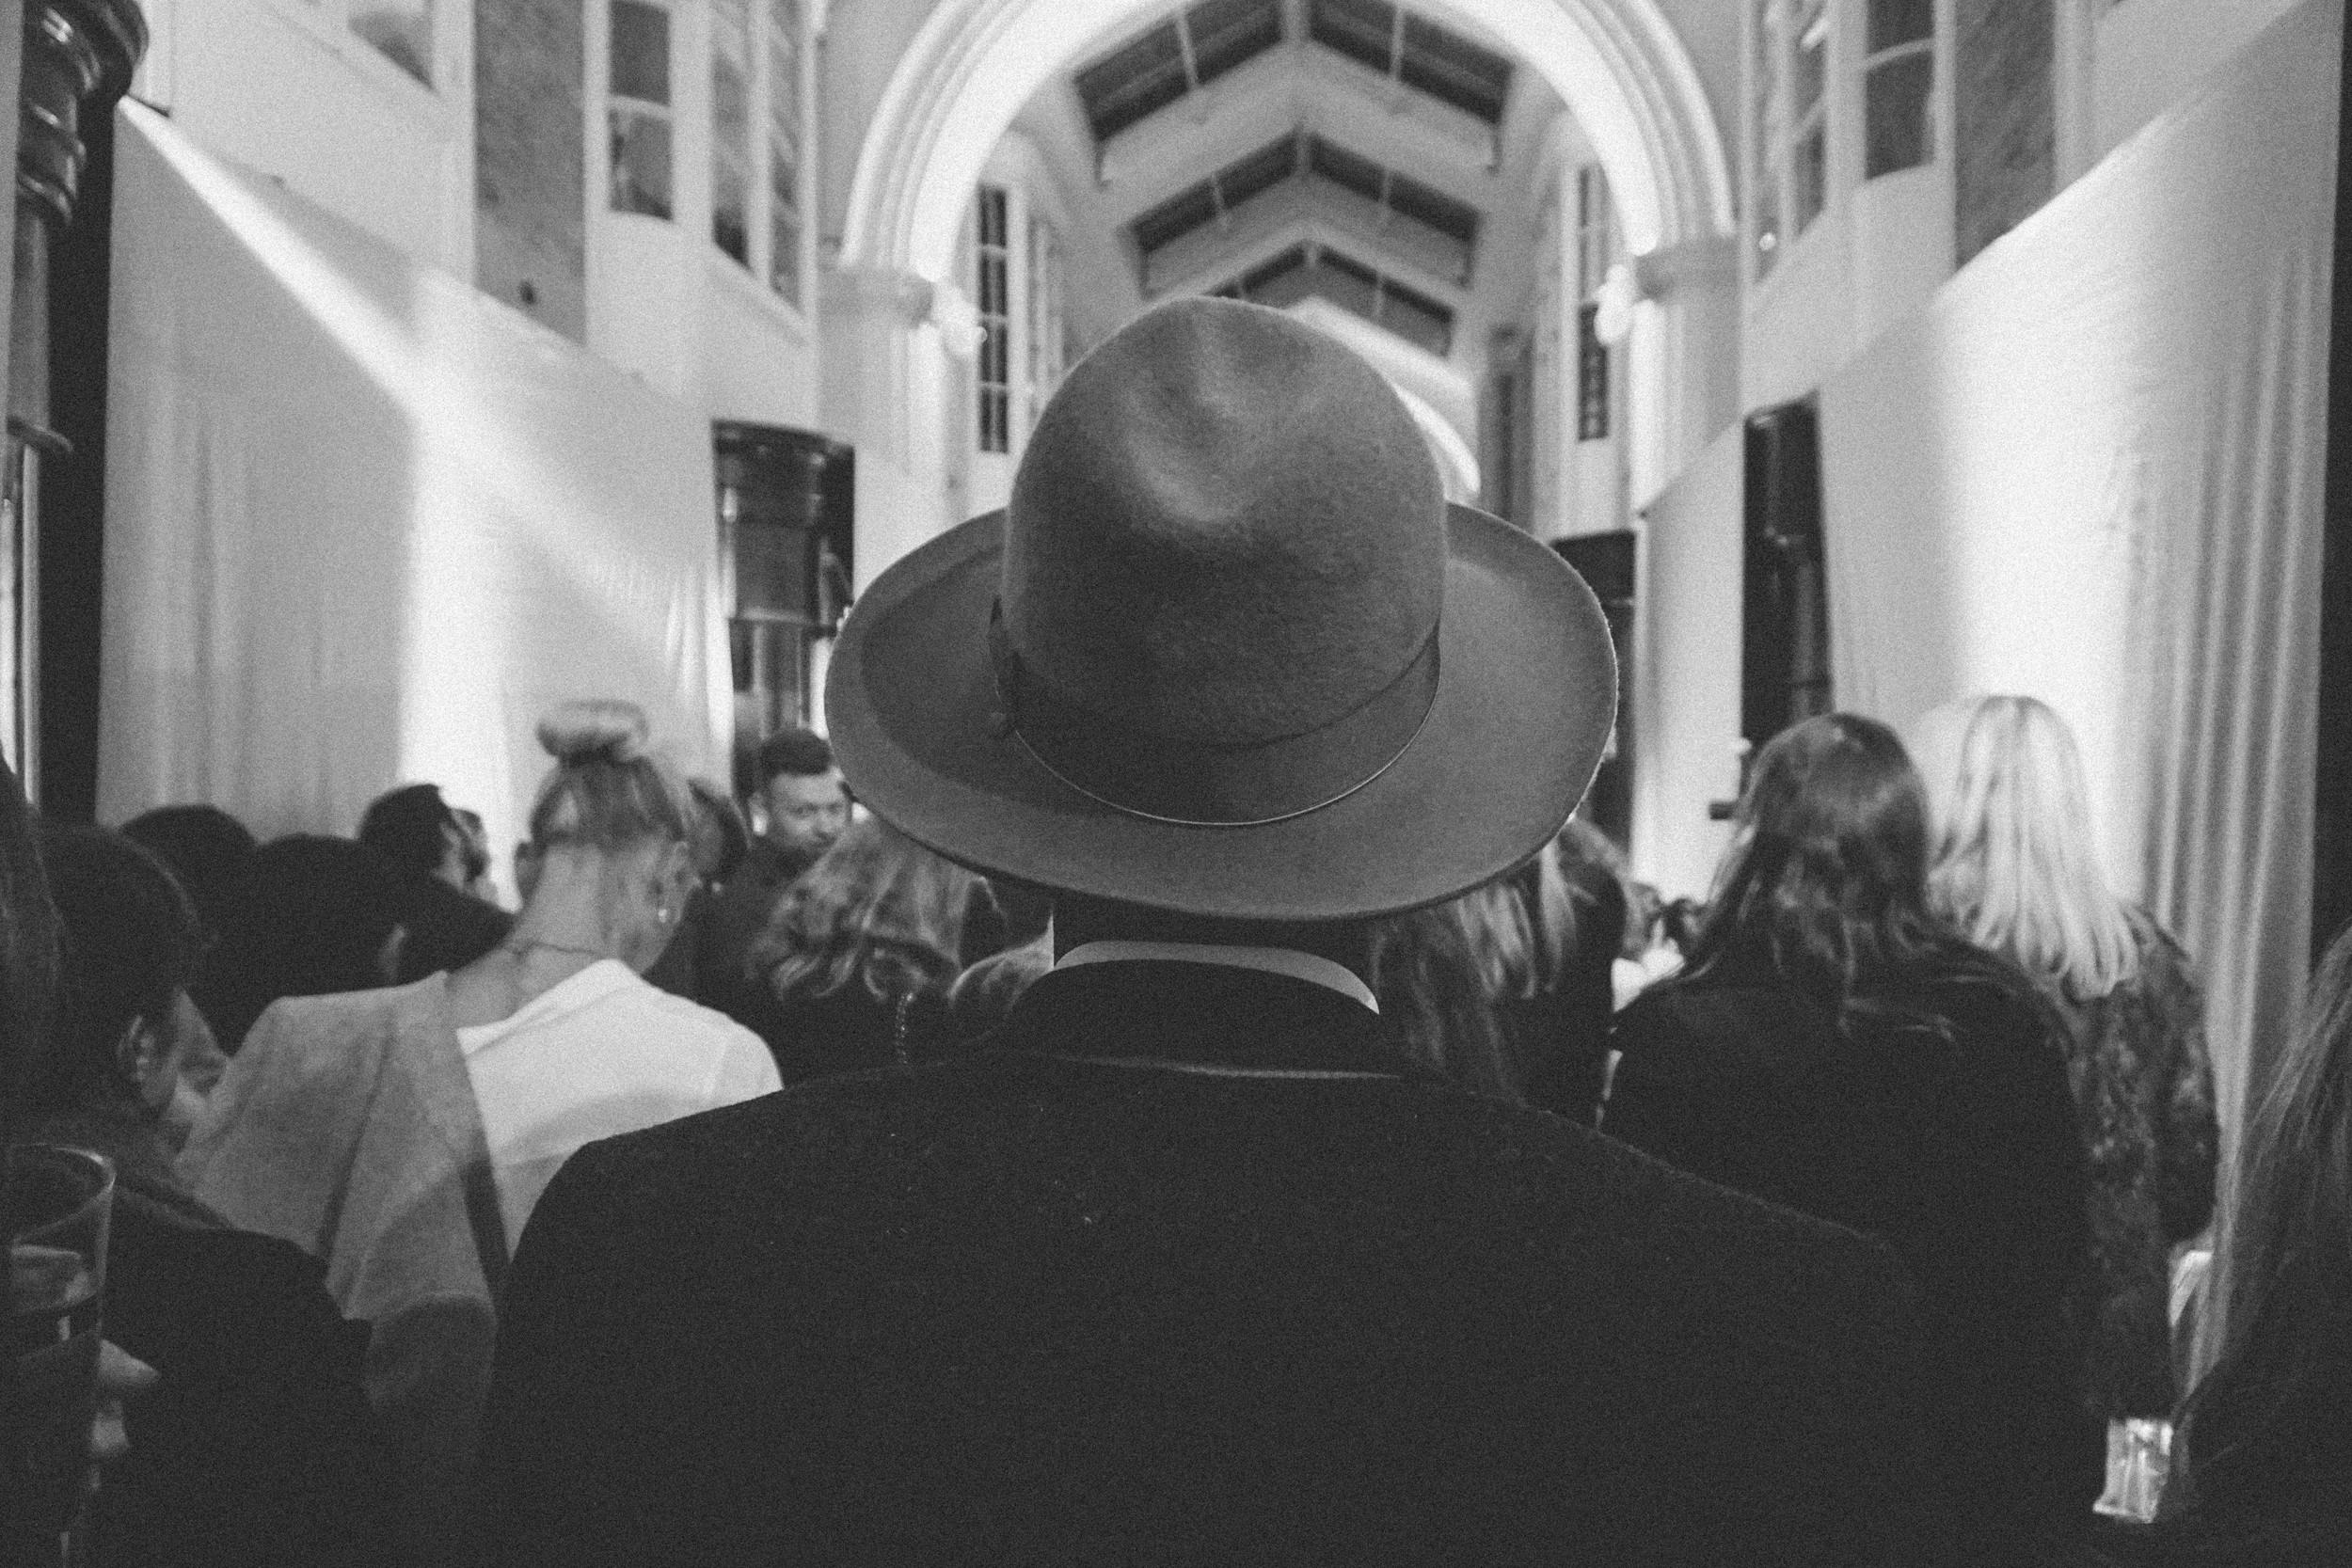 Cool hat at the Manolo Blahnik Burlington Arcade, Mayfair.